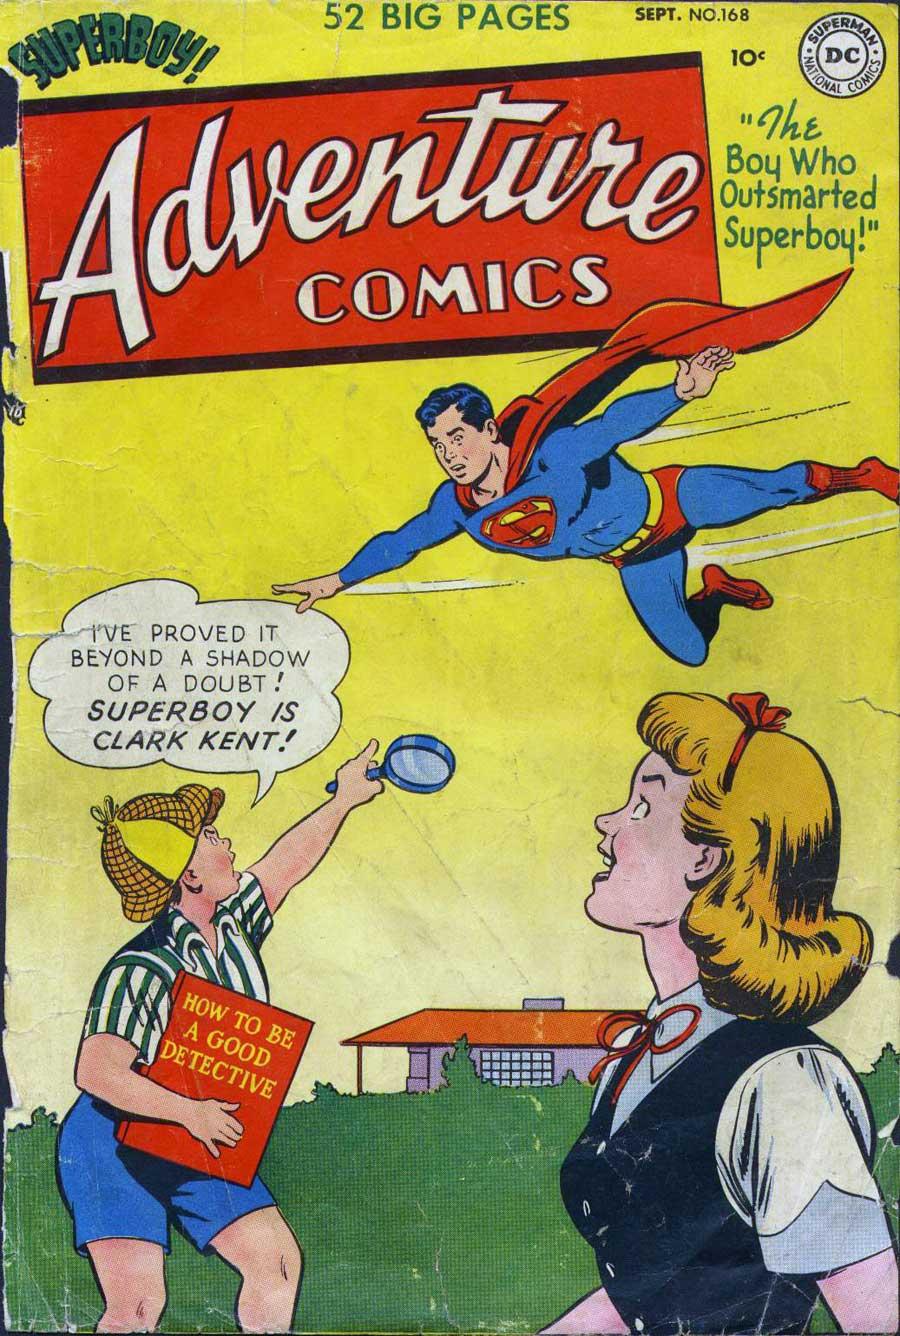 Adventure Comics #168 Sept 1951 cover